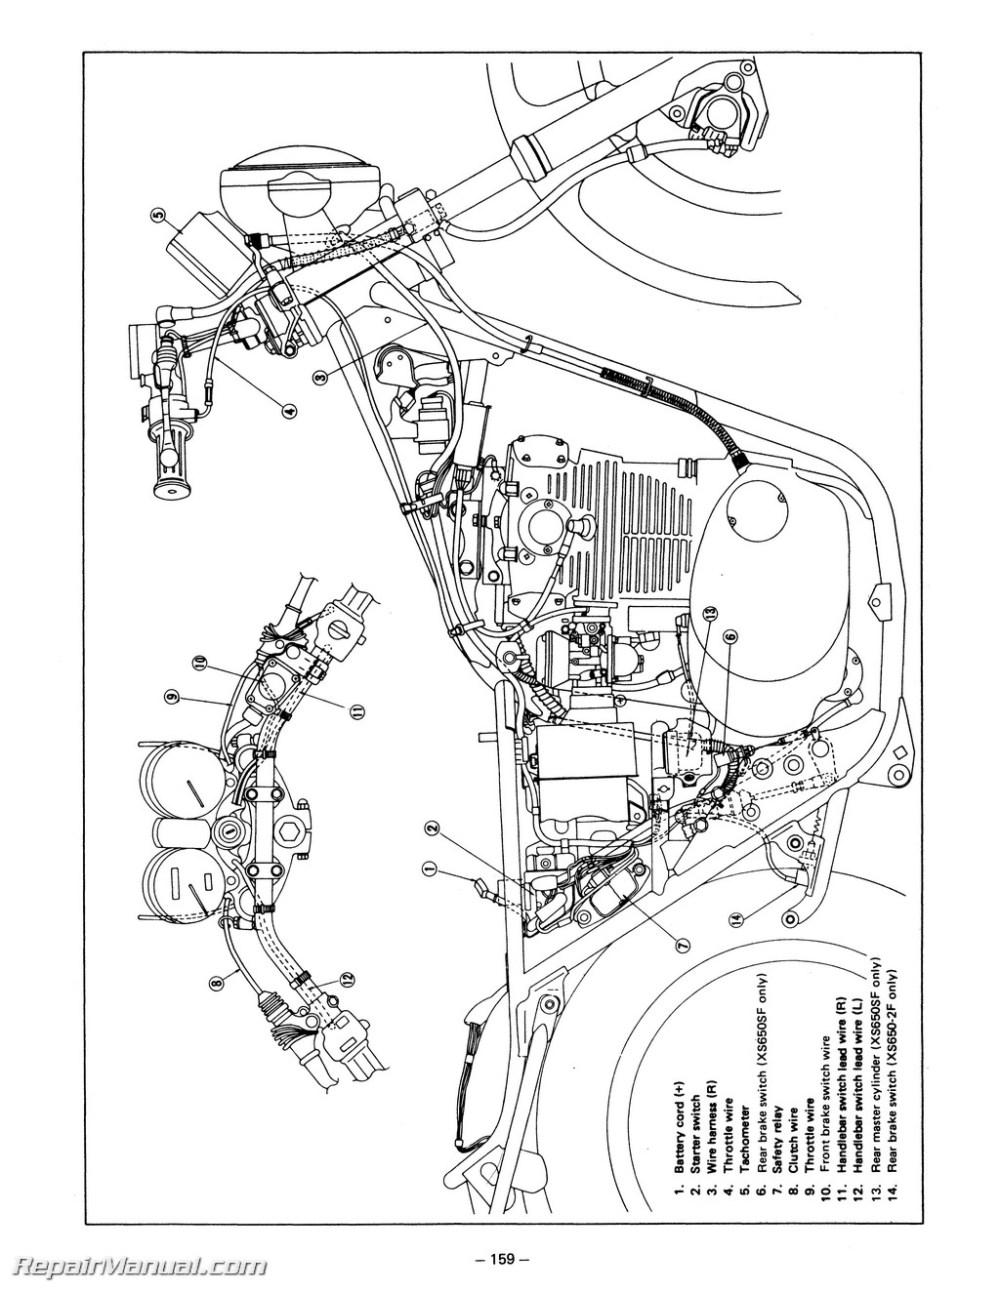 Stock Xs650 Wiring Harnes Diagram - wiring diagram kick only ... on xt350 wiring diagram, xj550 wiring diagram, xj750 wiring diagram, chopper wiring diagram, yz426f wiring diagram, xs360 wiring diagram, xvz1300 wiring diagram, xvs650 wiring diagram, virago wiring diagram, xs400 wiring diagram, xv920 wiring diagram, xs850 wiring diagram, cb750 wiring diagram, xv535 wiring diagram, xs1100 wiring diagram, xj650 wiring diagram, fj1100 wiring diagram, it 250 wiring diagram, fz700 wiring diagram, yamaha wiring diagram,